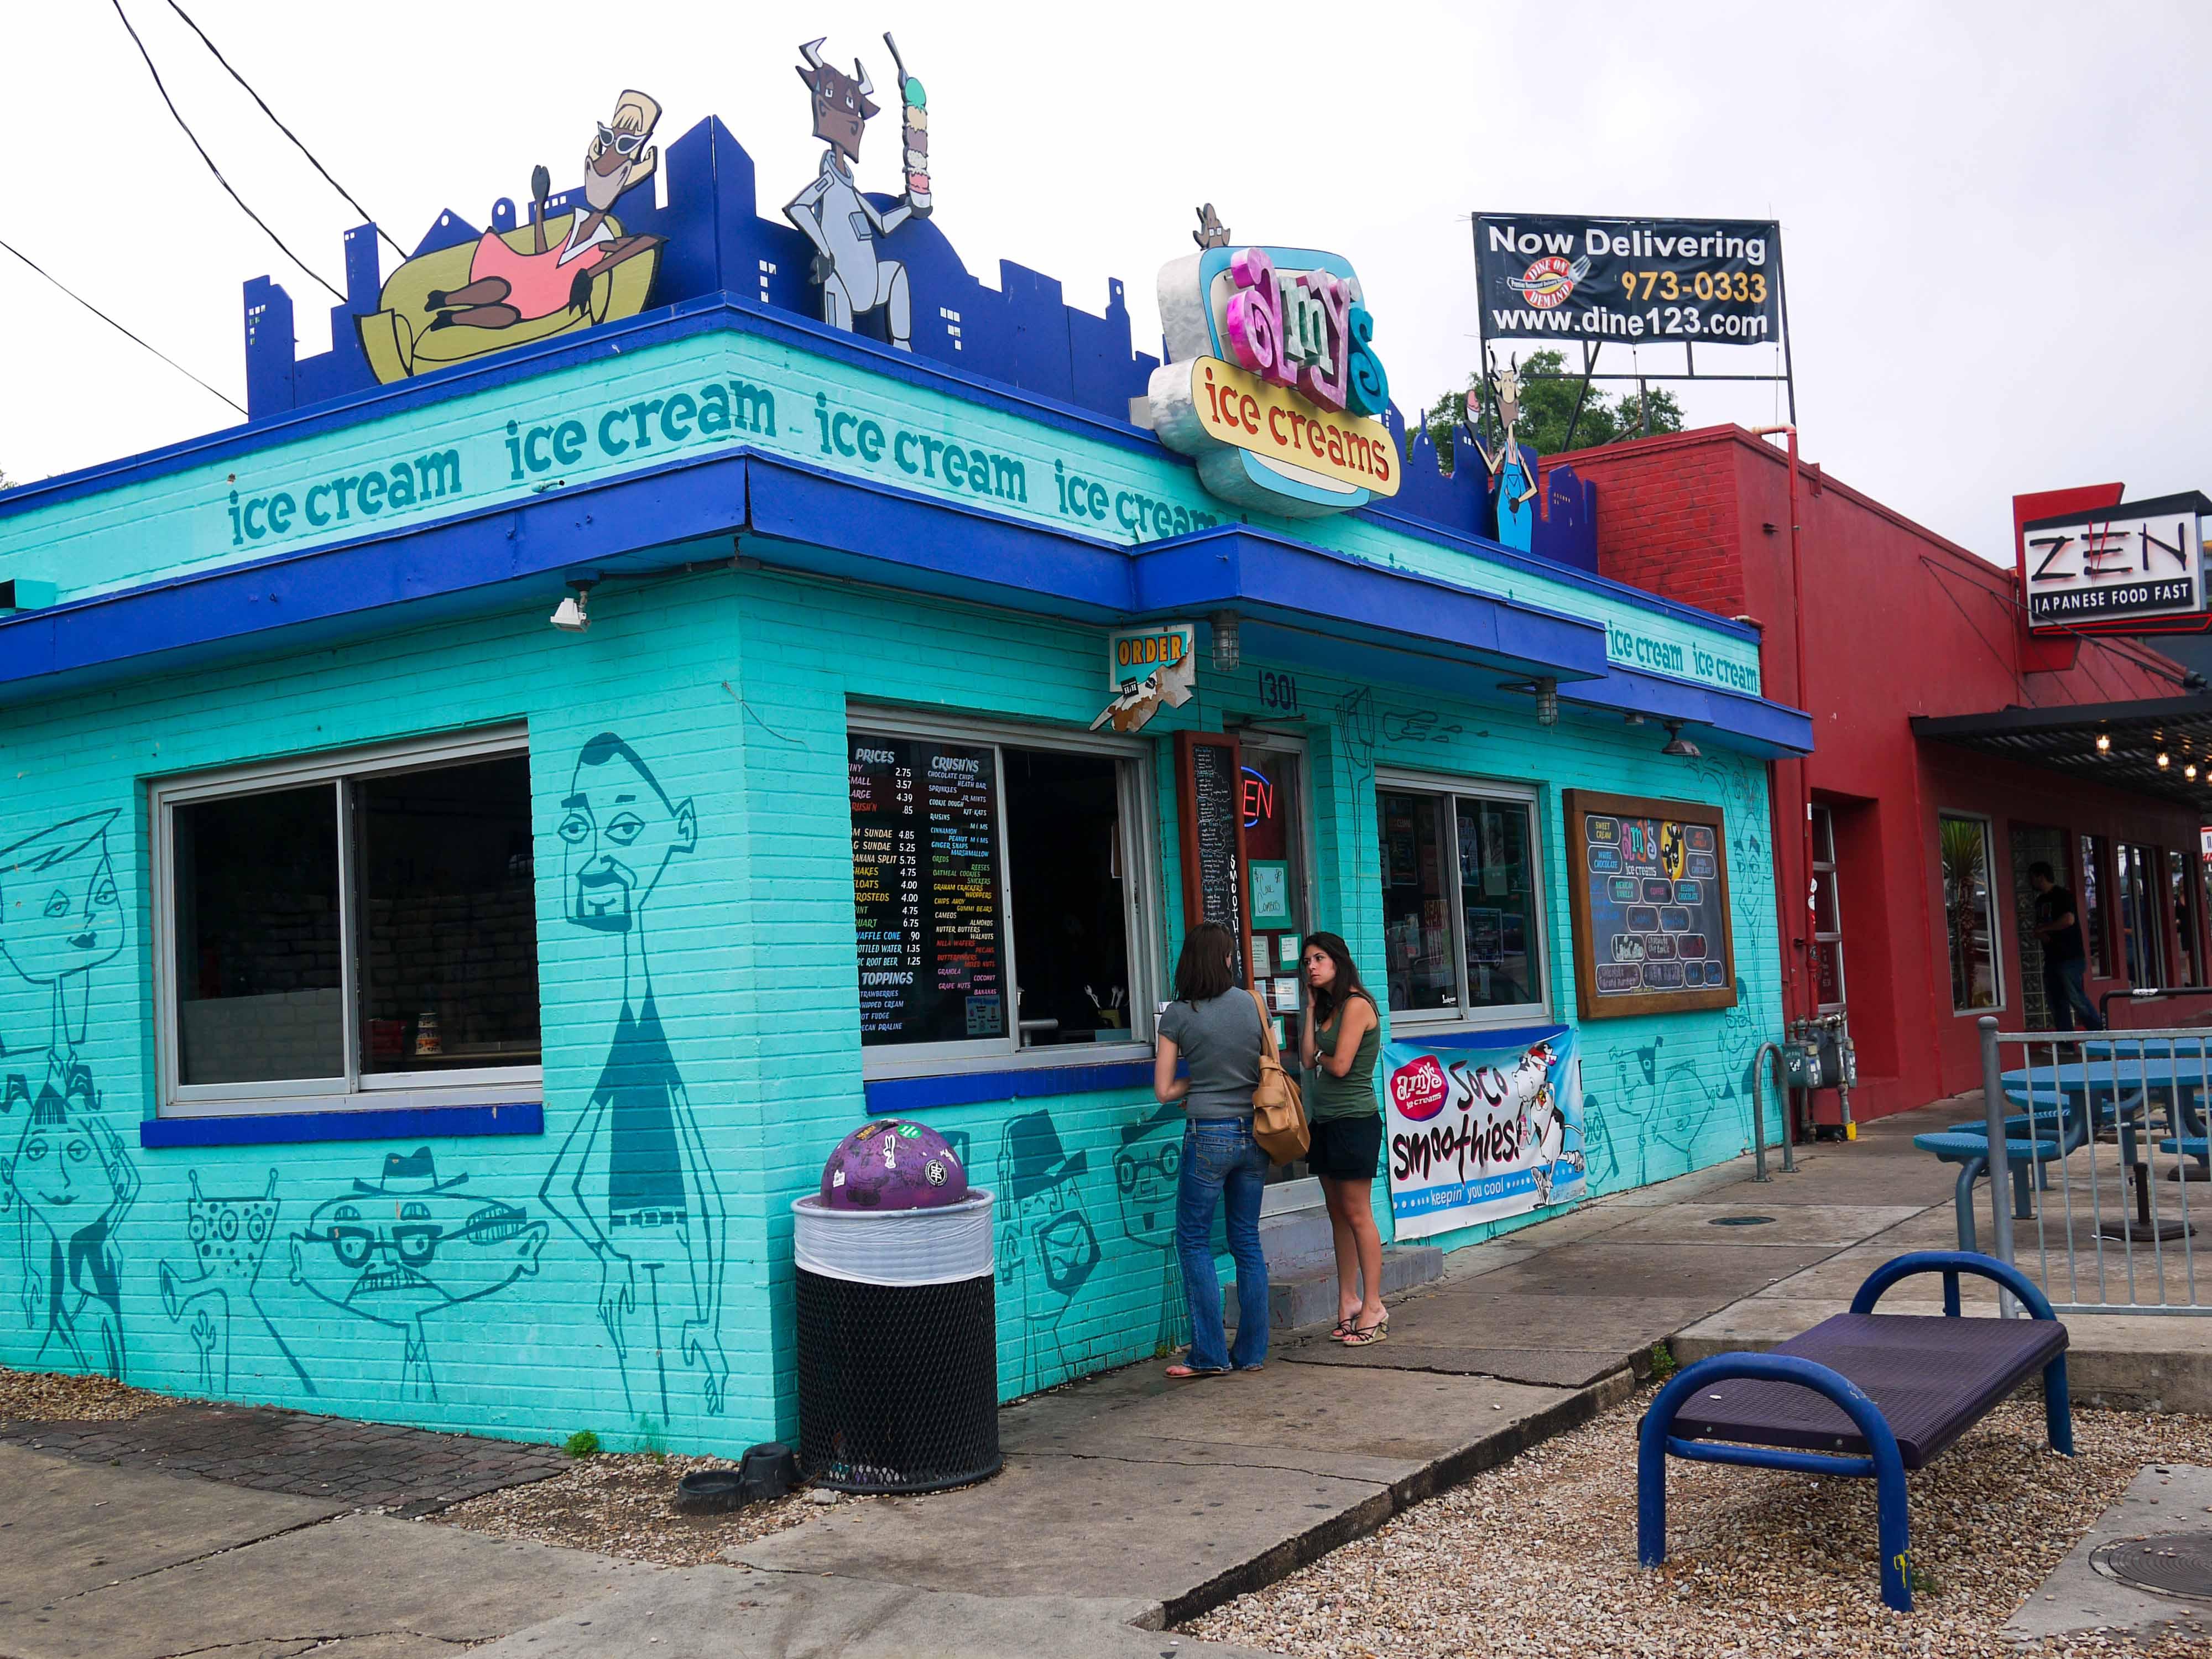 File:Amy's ice cream in Austin.jpg - Wikimedia Commons